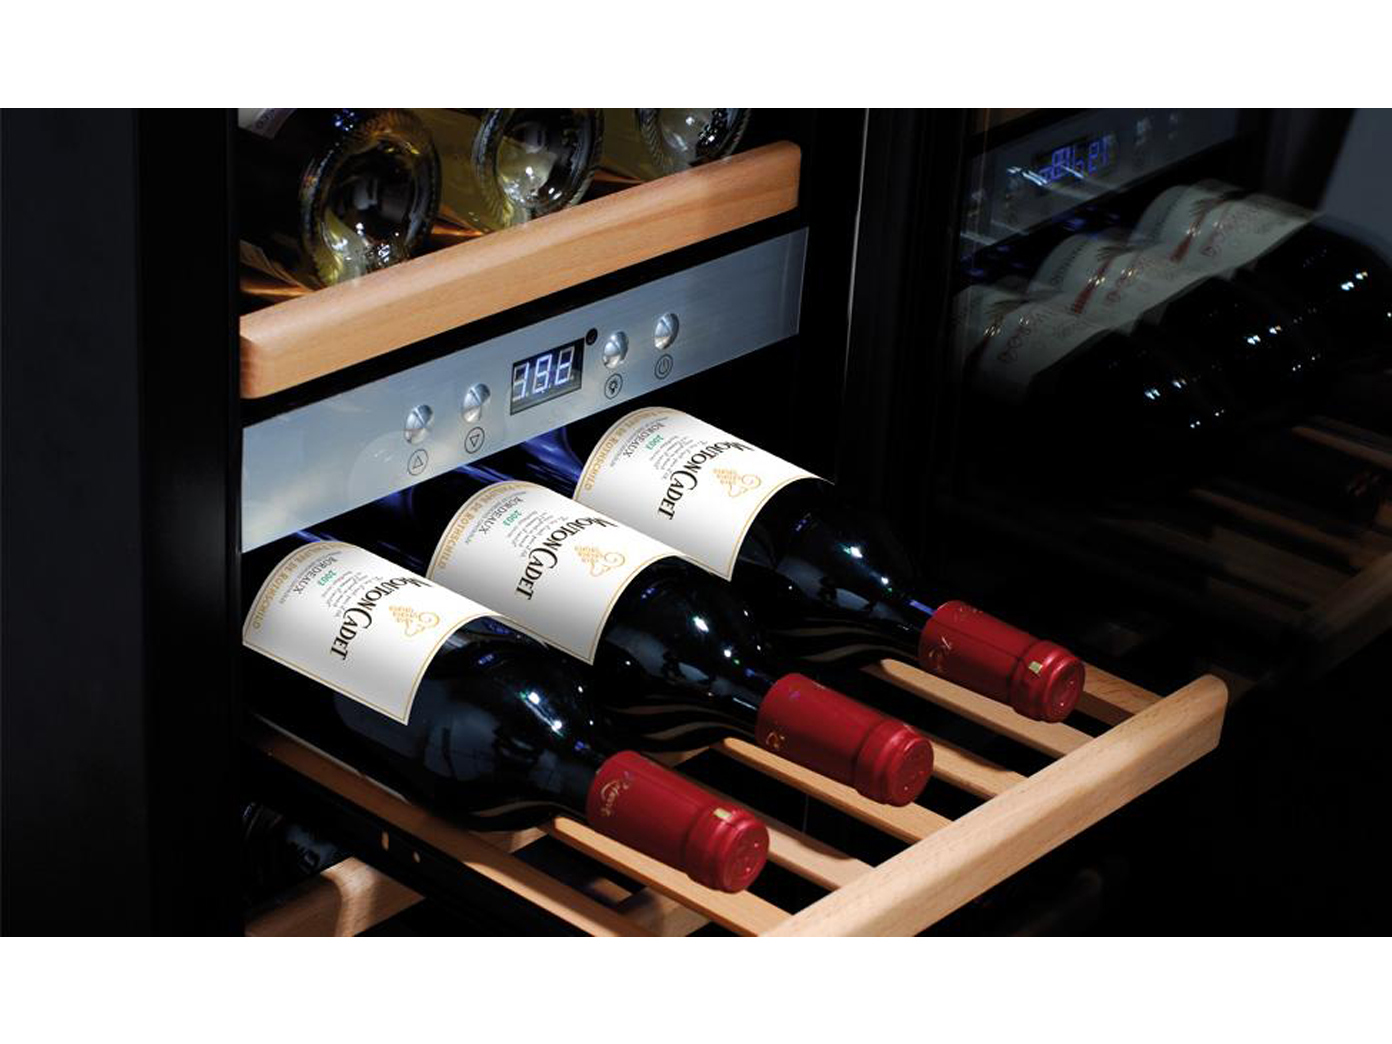 profi weink hlschrank 38 flaschen 2 zonen winecooler getr nke k hlschrank eur 825 99. Black Bedroom Furniture Sets. Home Design Ideas